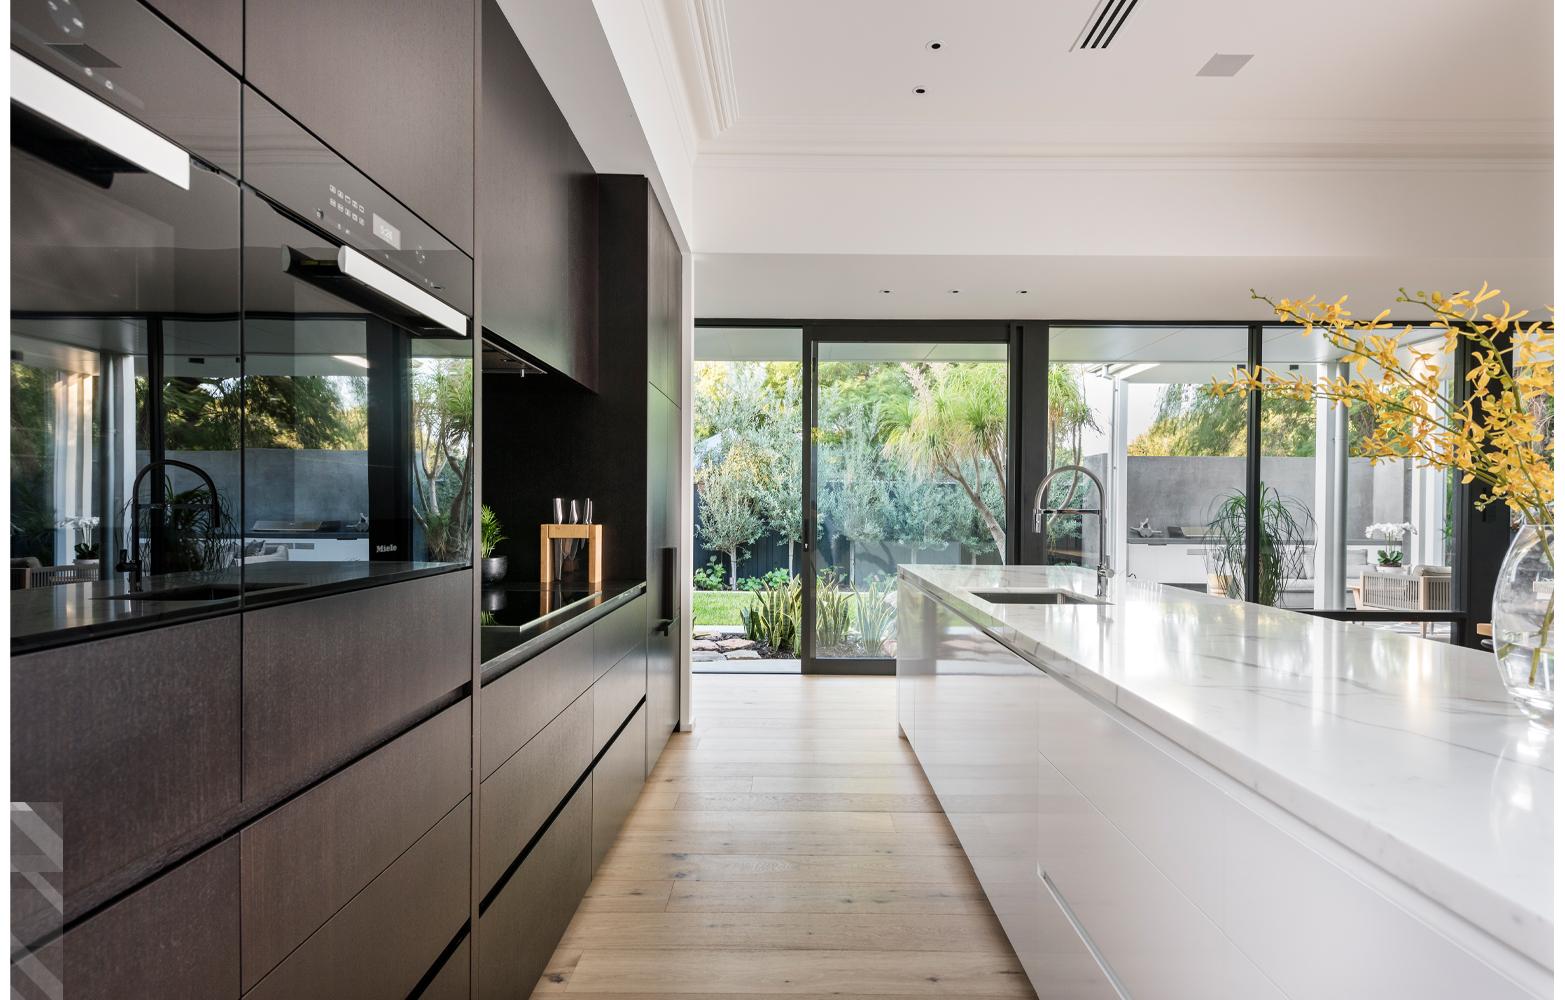 maek-luxury-home-design-inspiration-mosmanpark-27m-gallery-5.jpg